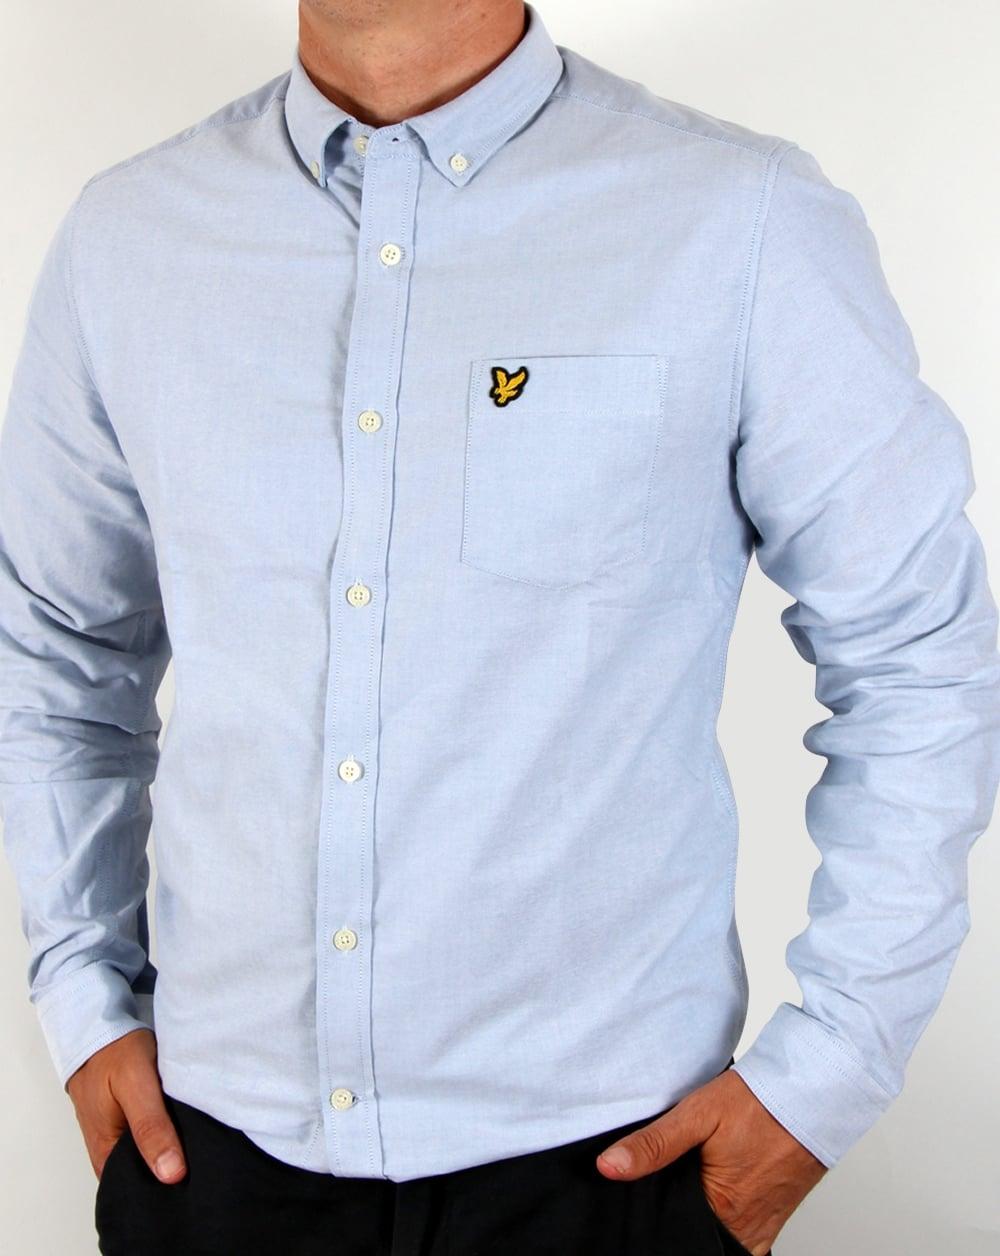 Lyle And Scott Oxford Long Sleeve Shirt Riviera Blue